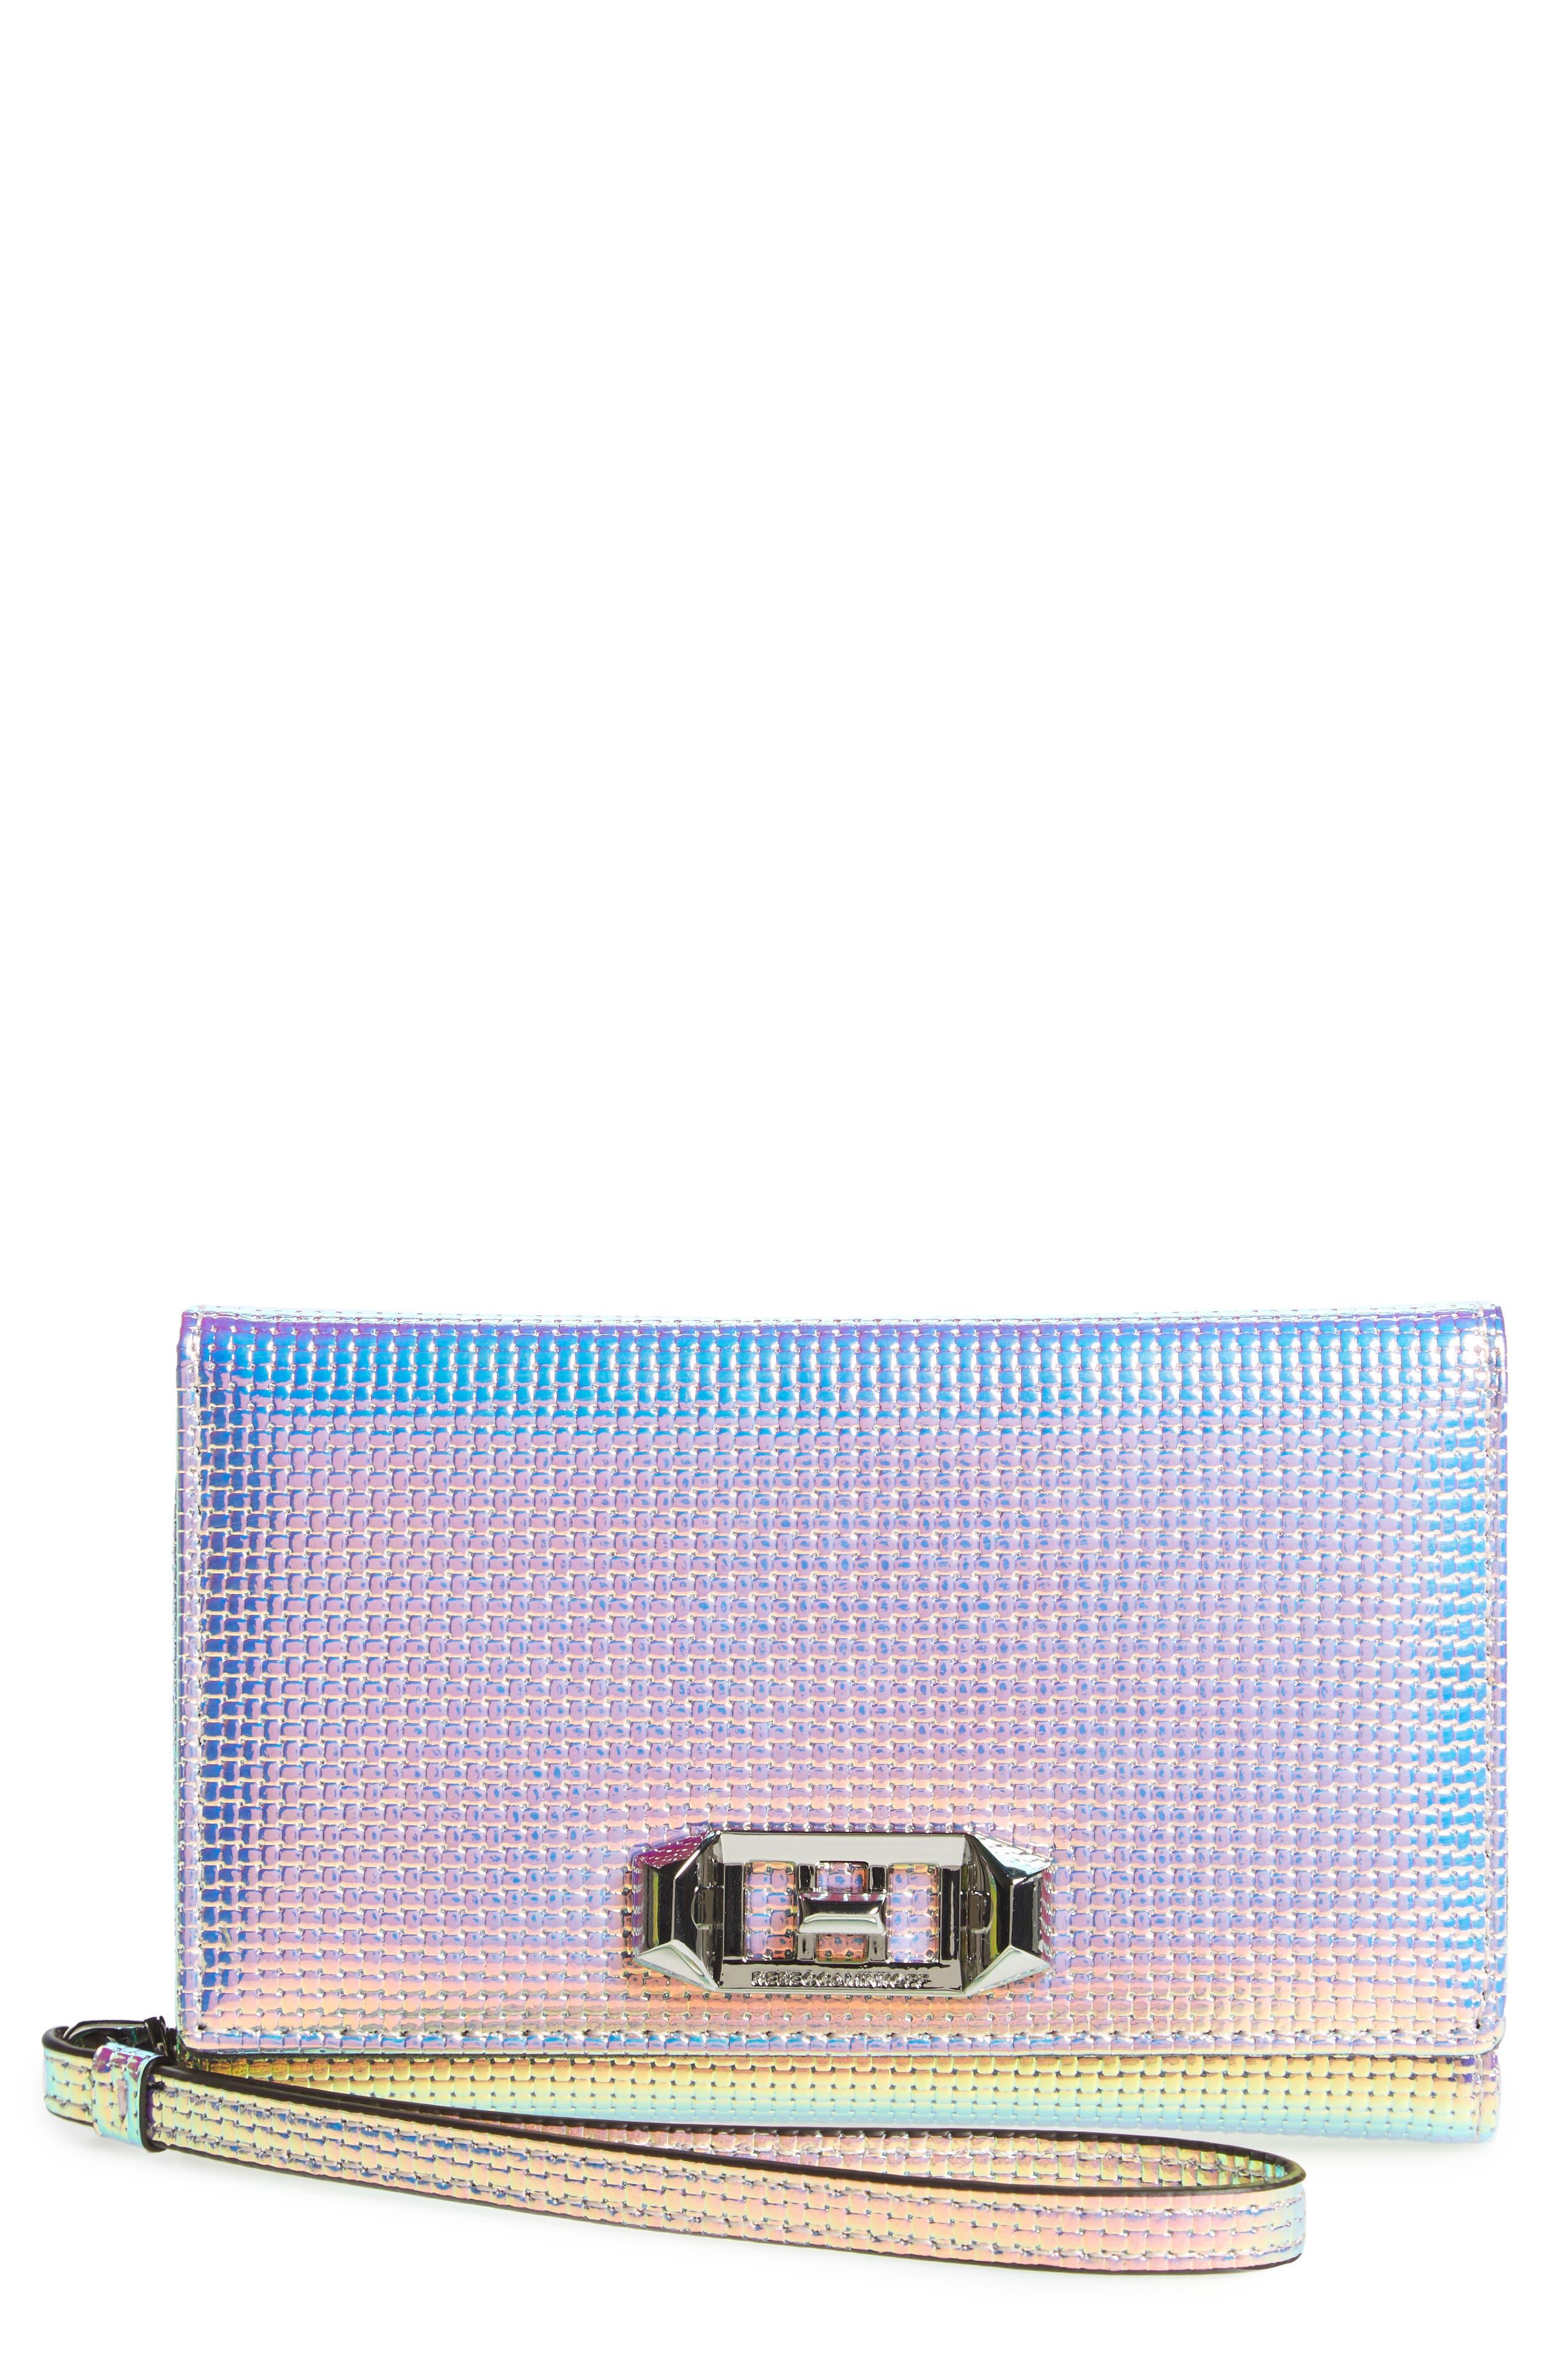 Main Image - Rebecca Minkoff Love Lock iPhone X Metallic Leather Wristlet Folio